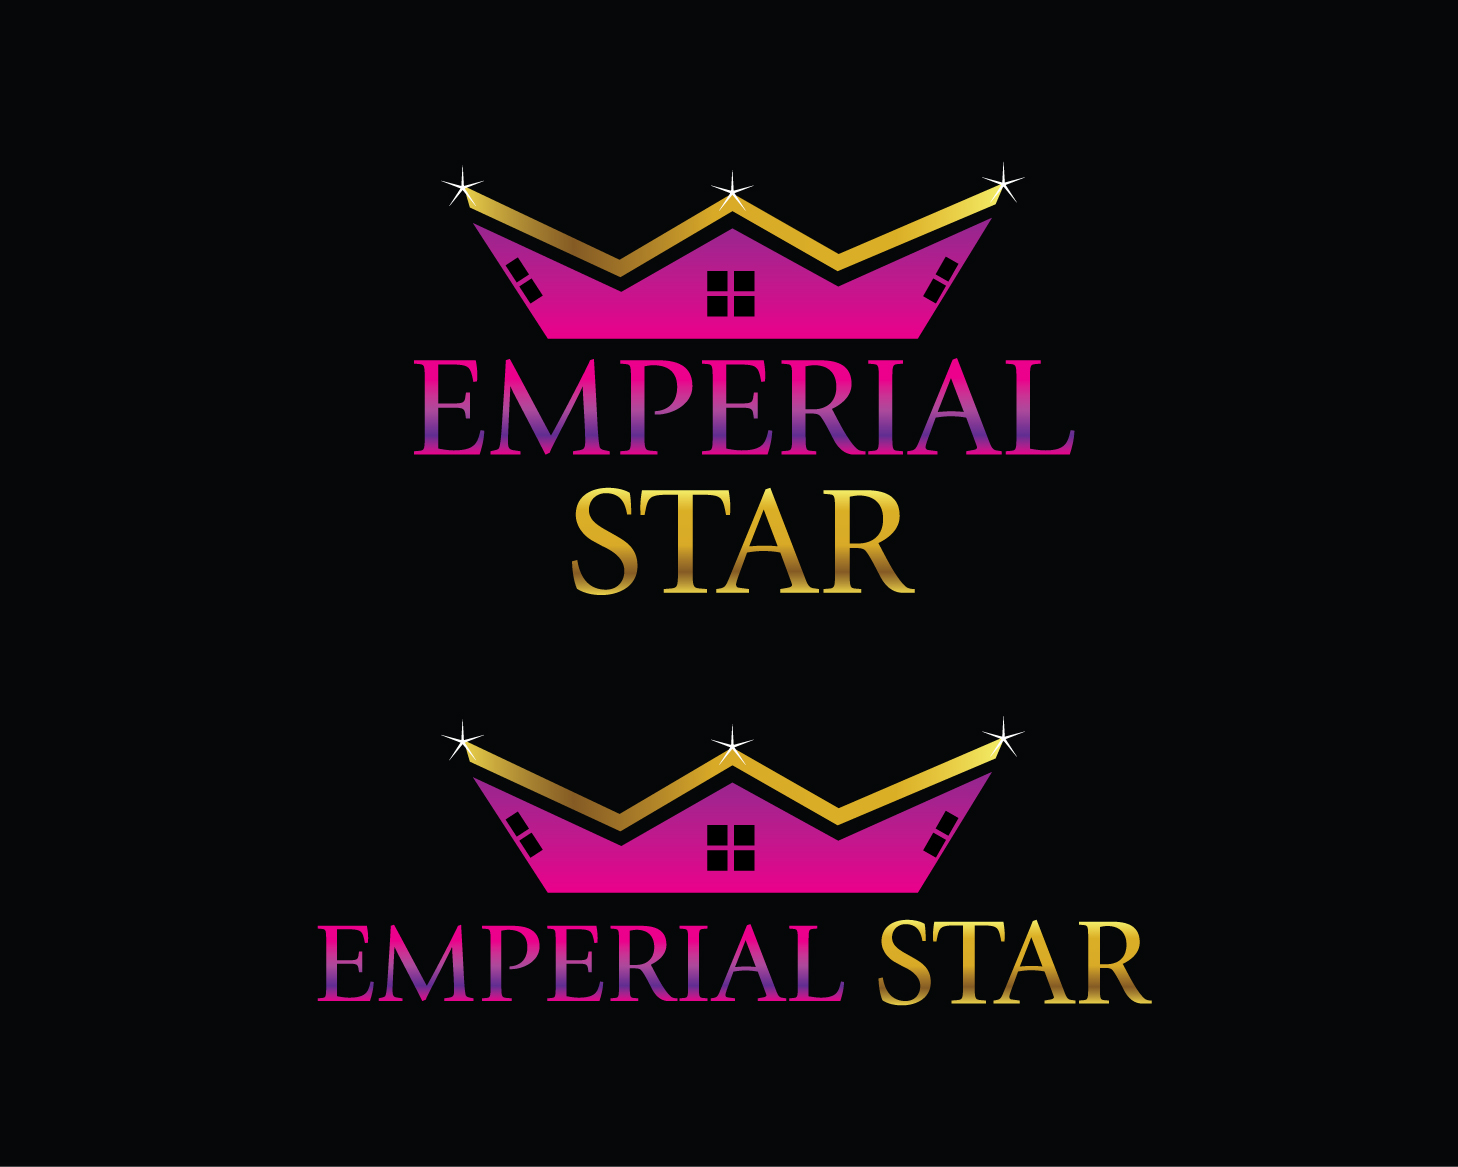 Logo Design by rA - Entry No. 81 in the Logo Design Contest Emperial Star Logo Design.